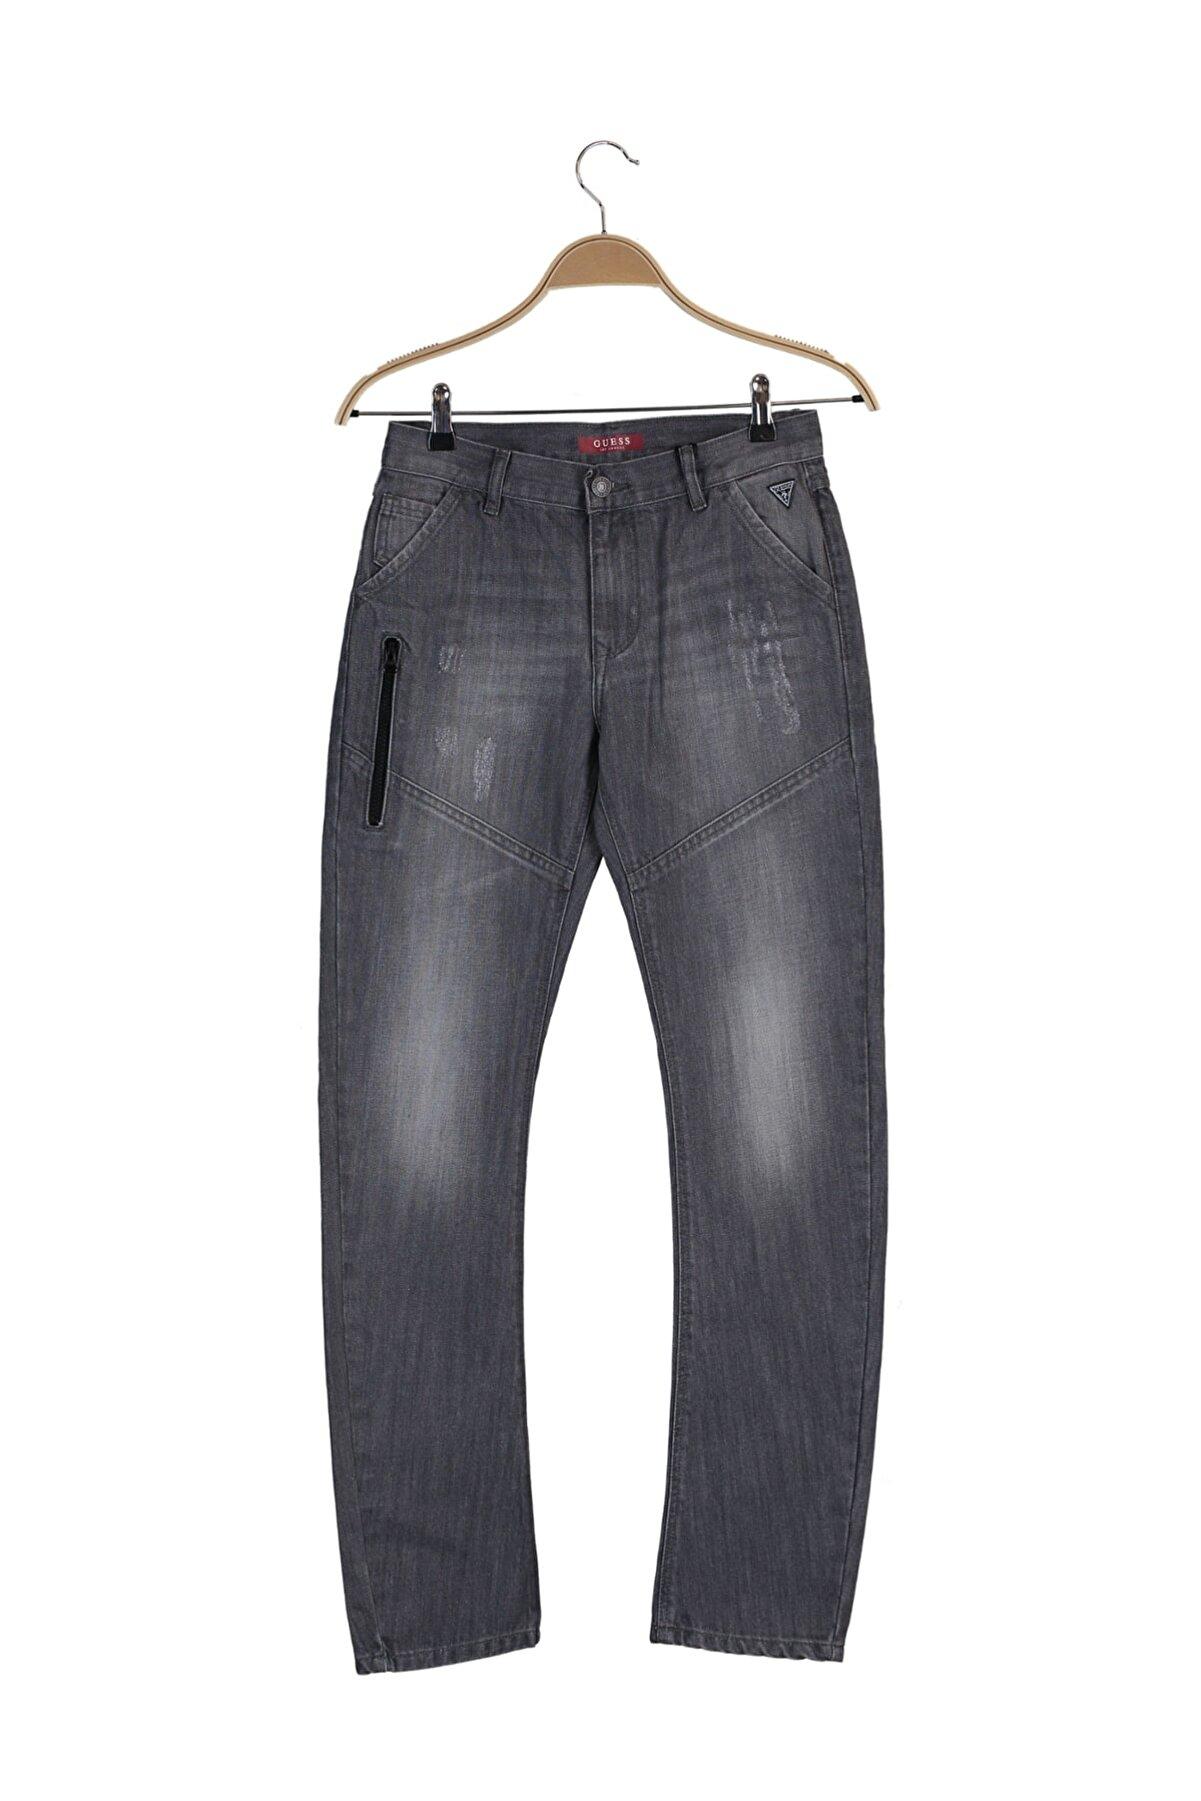 Guess Kadın Jeans GUE202811